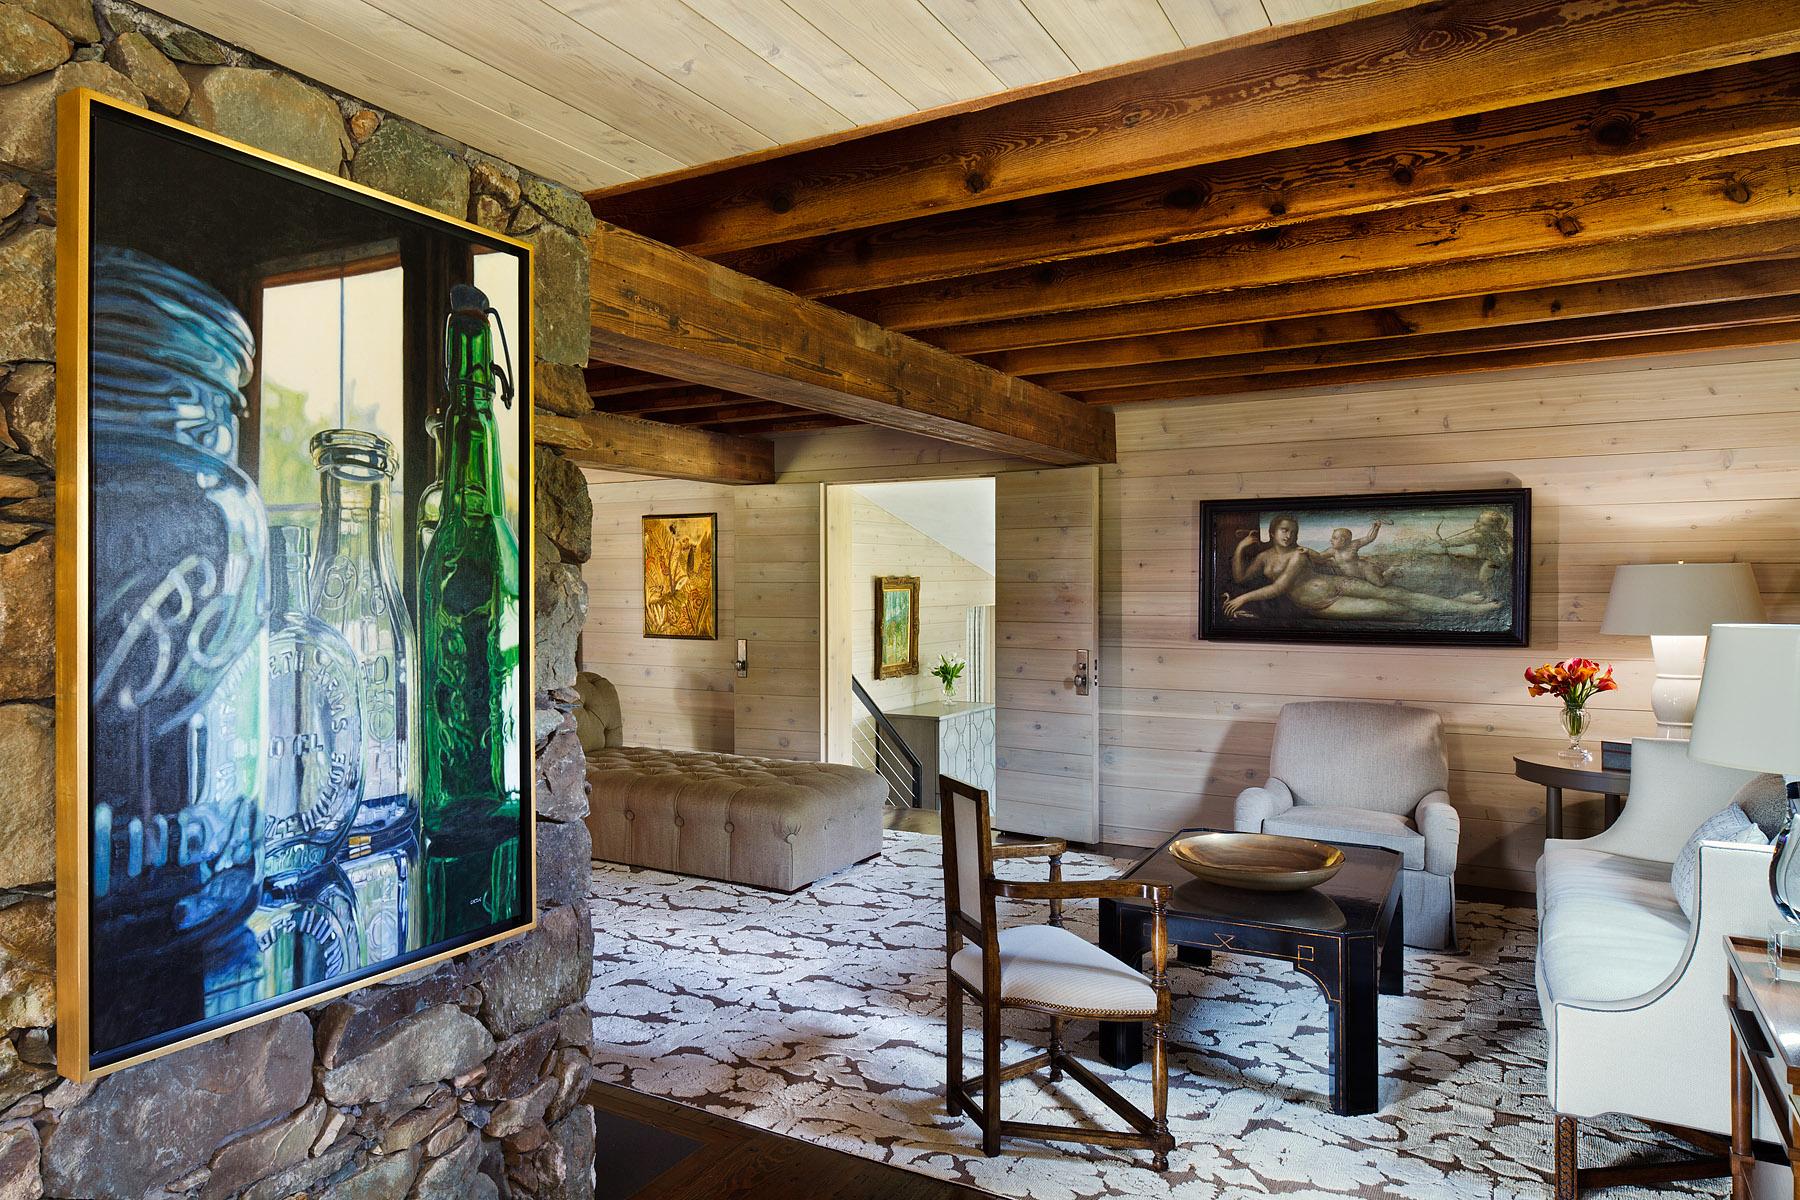 Interior Design by Jay Jenkins, Art by Merritt Gallery & Renaissance Fine Arts